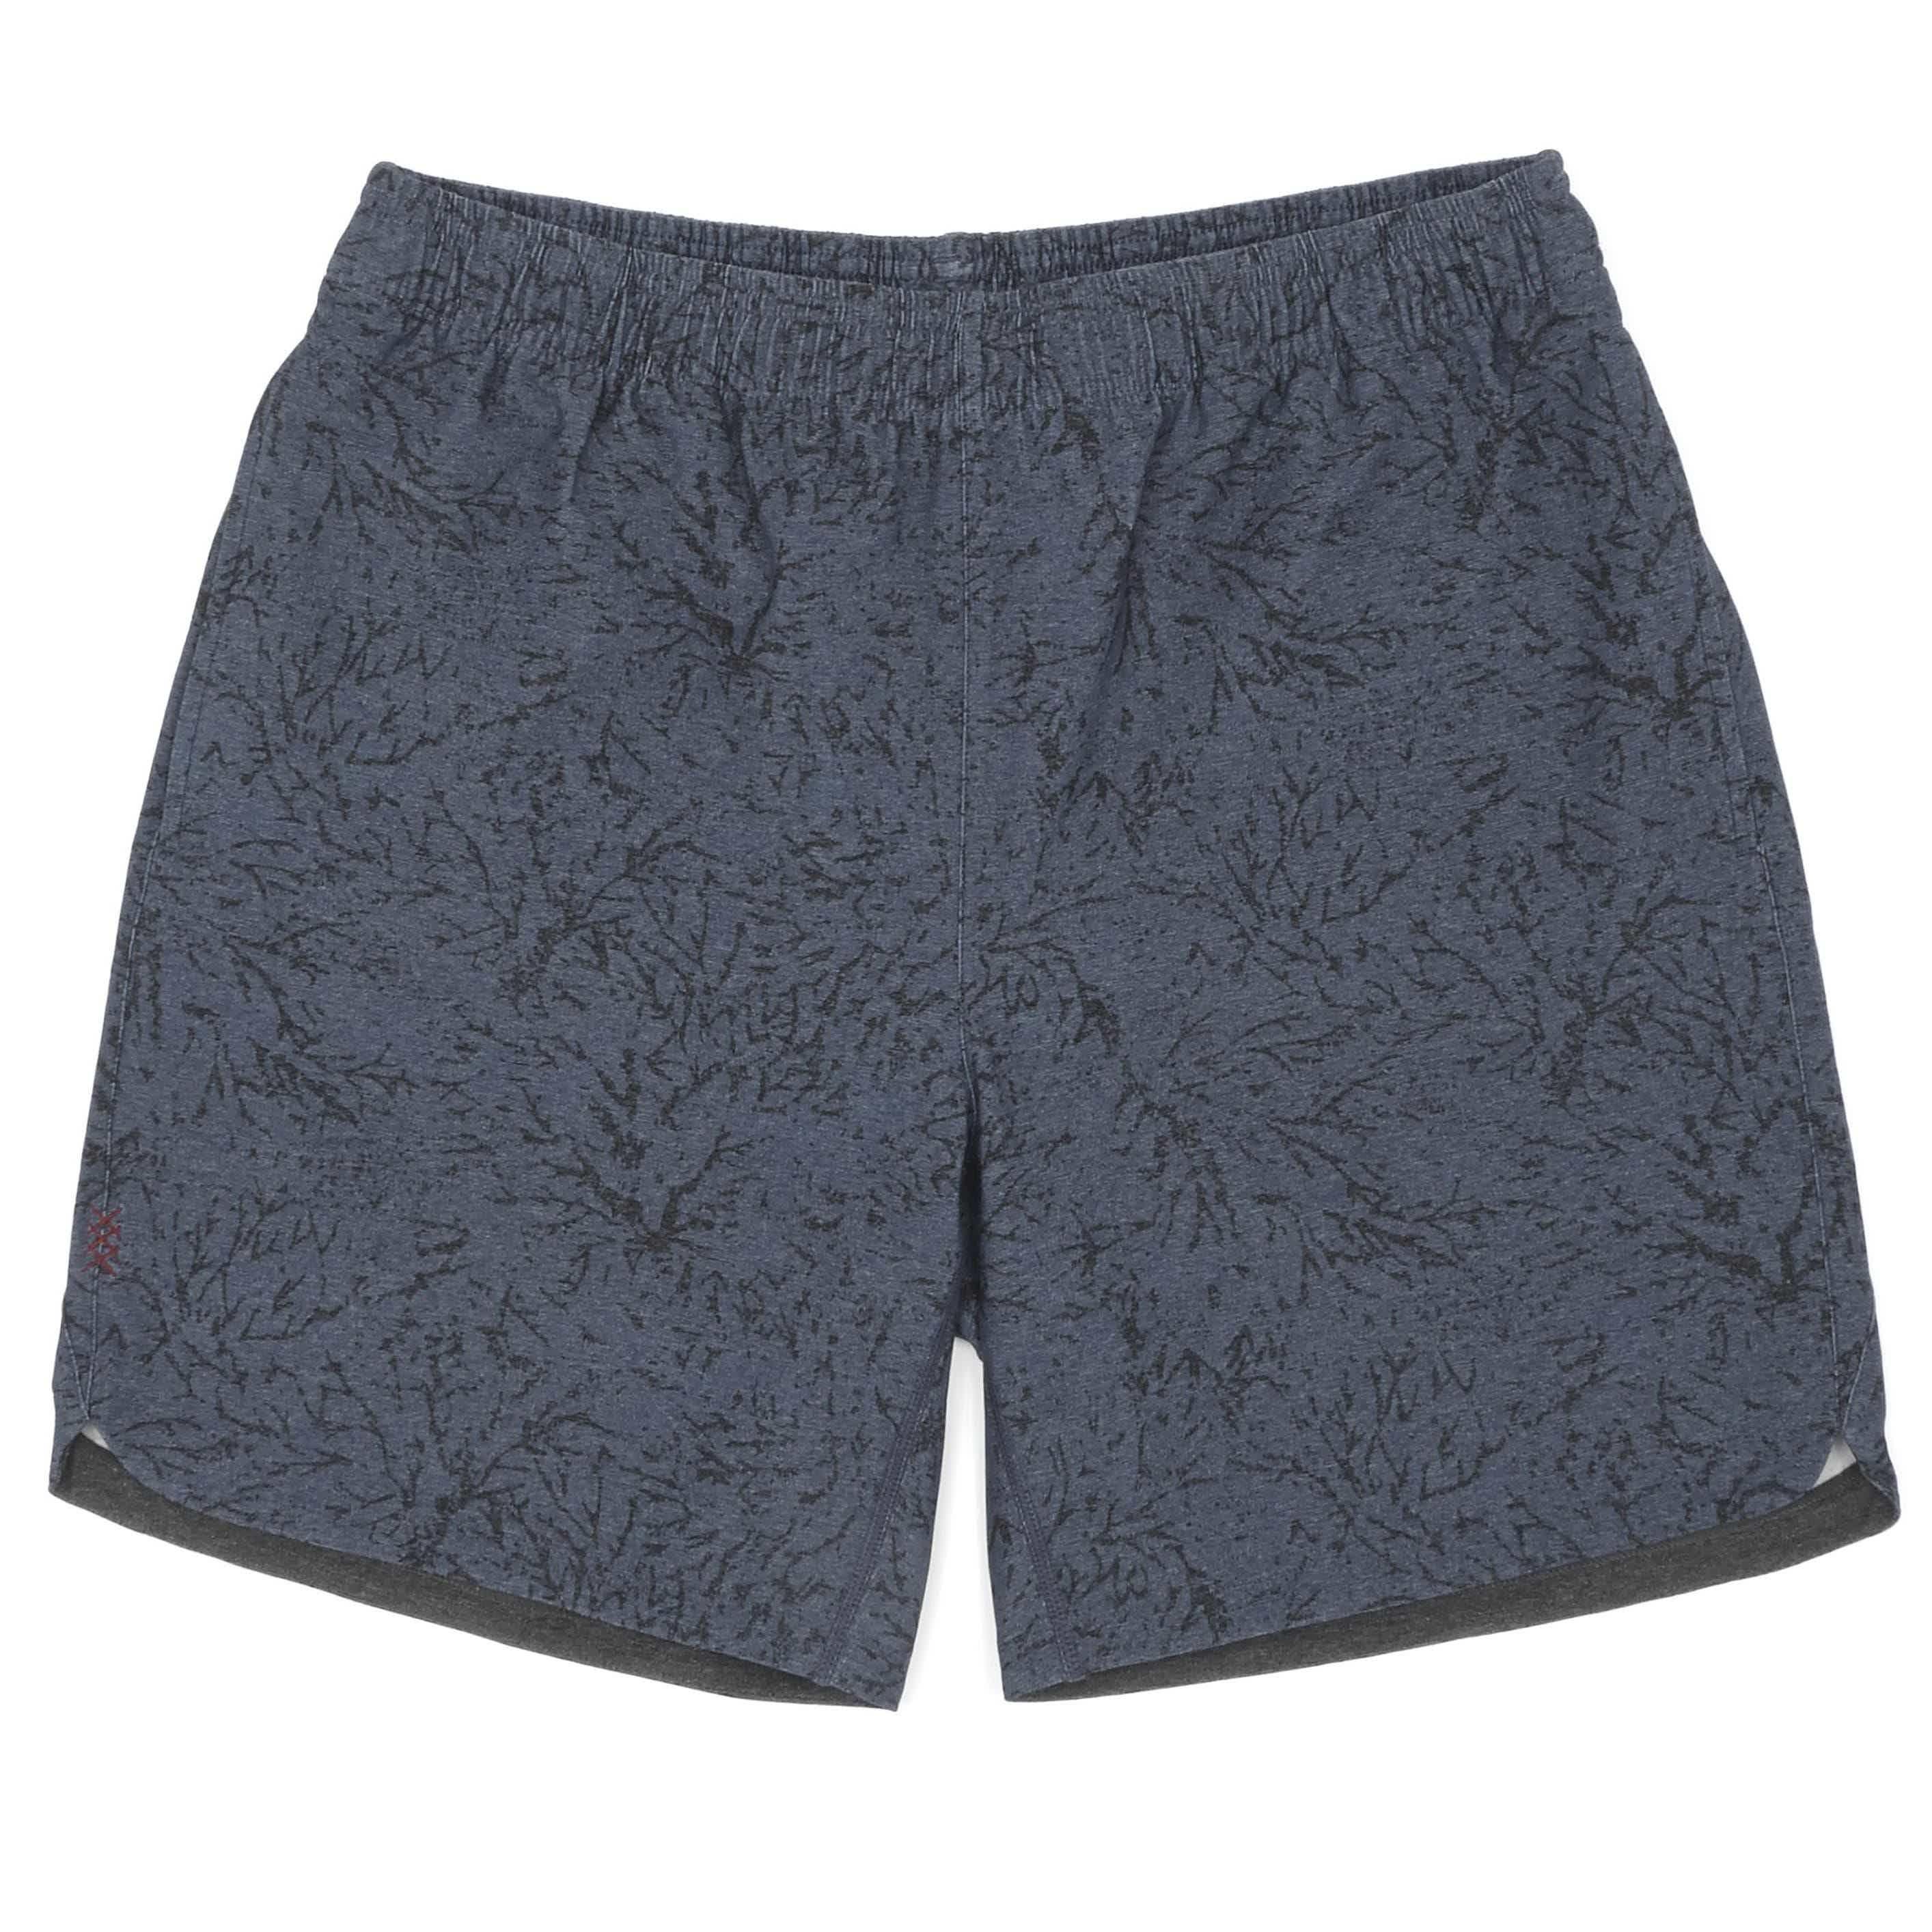 Black/Navy Print Guru Shorts